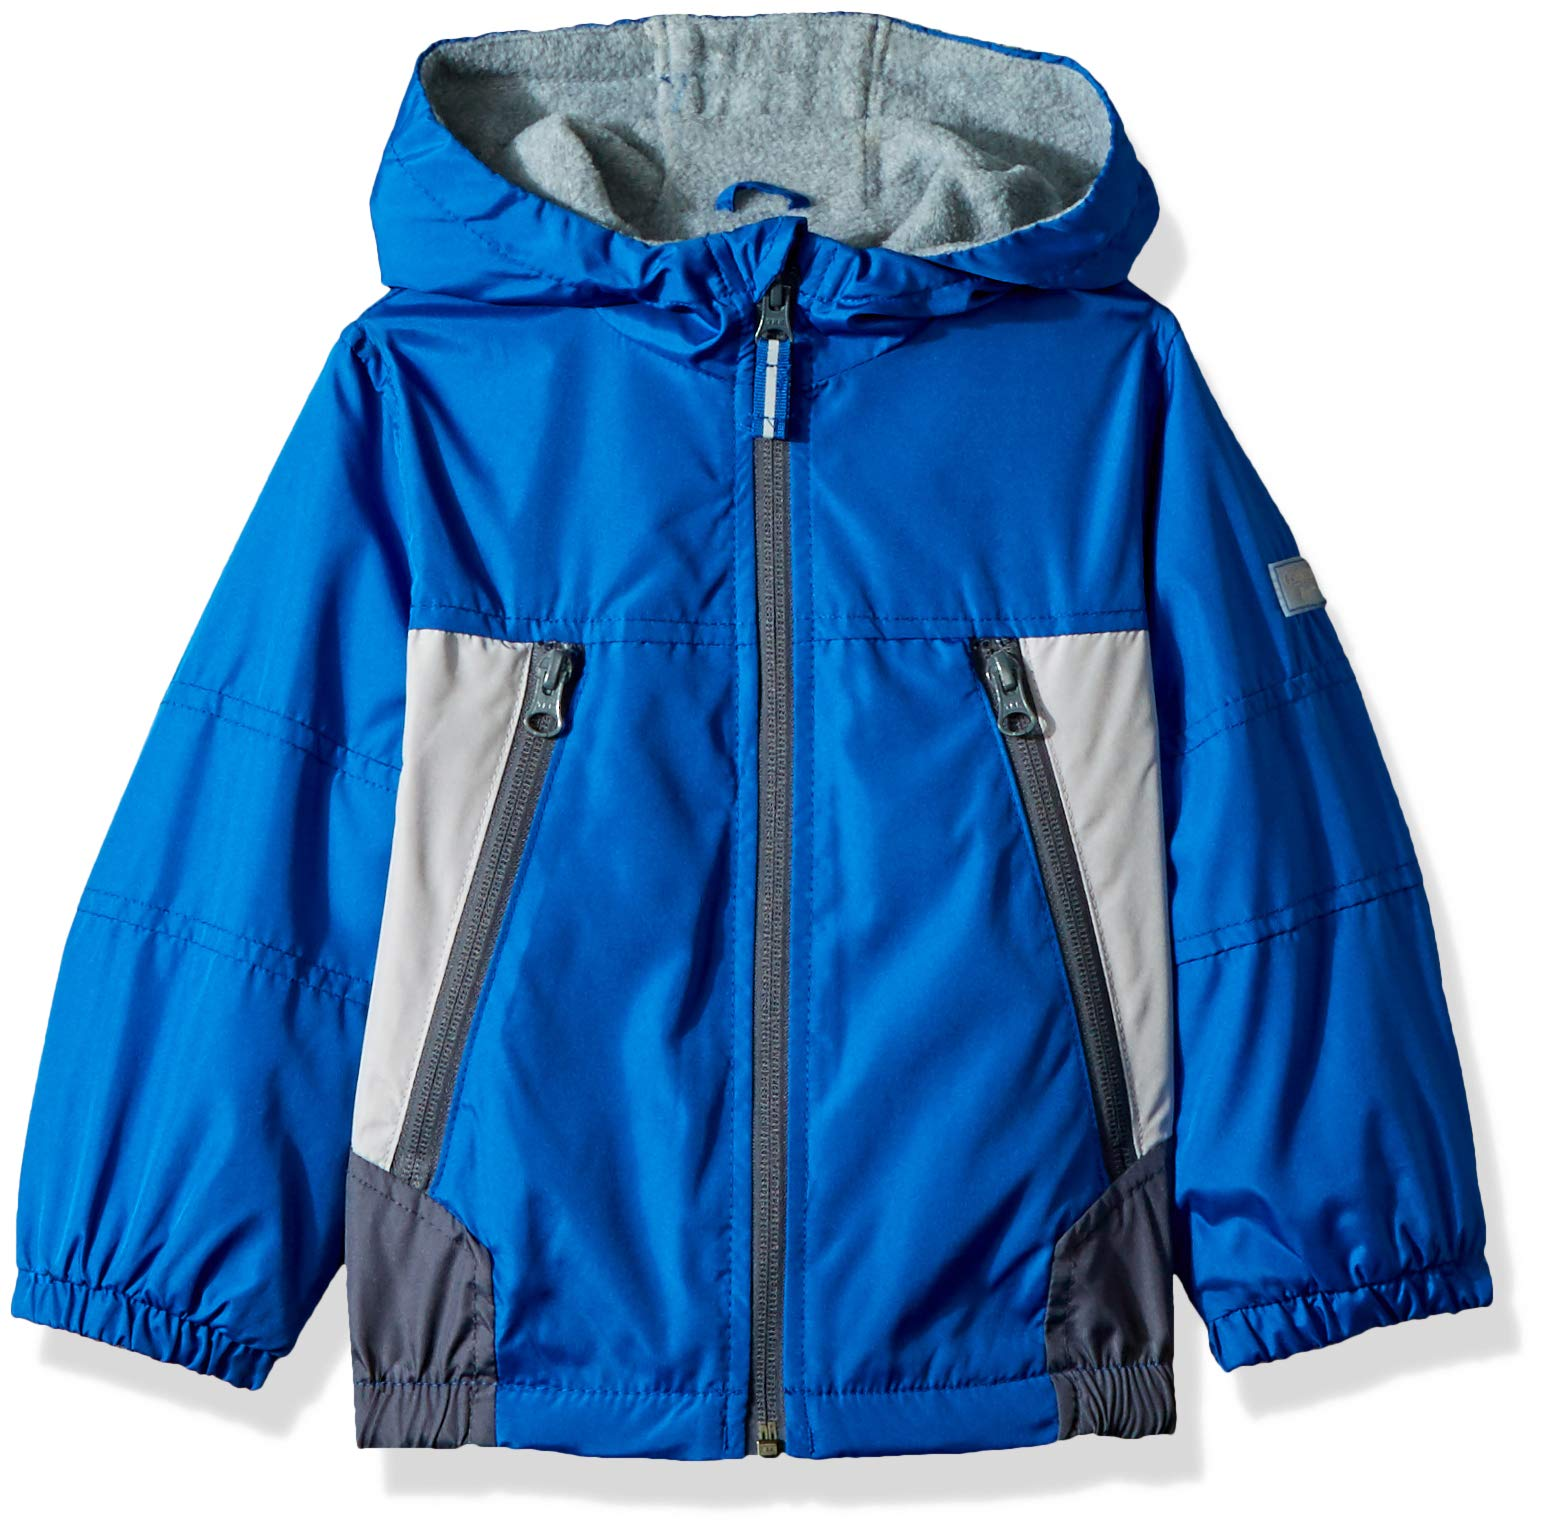 Osh Kosh Boys' Toddler Midweight Jacket, Cosmic Cobalt/Silver/Grey 2T